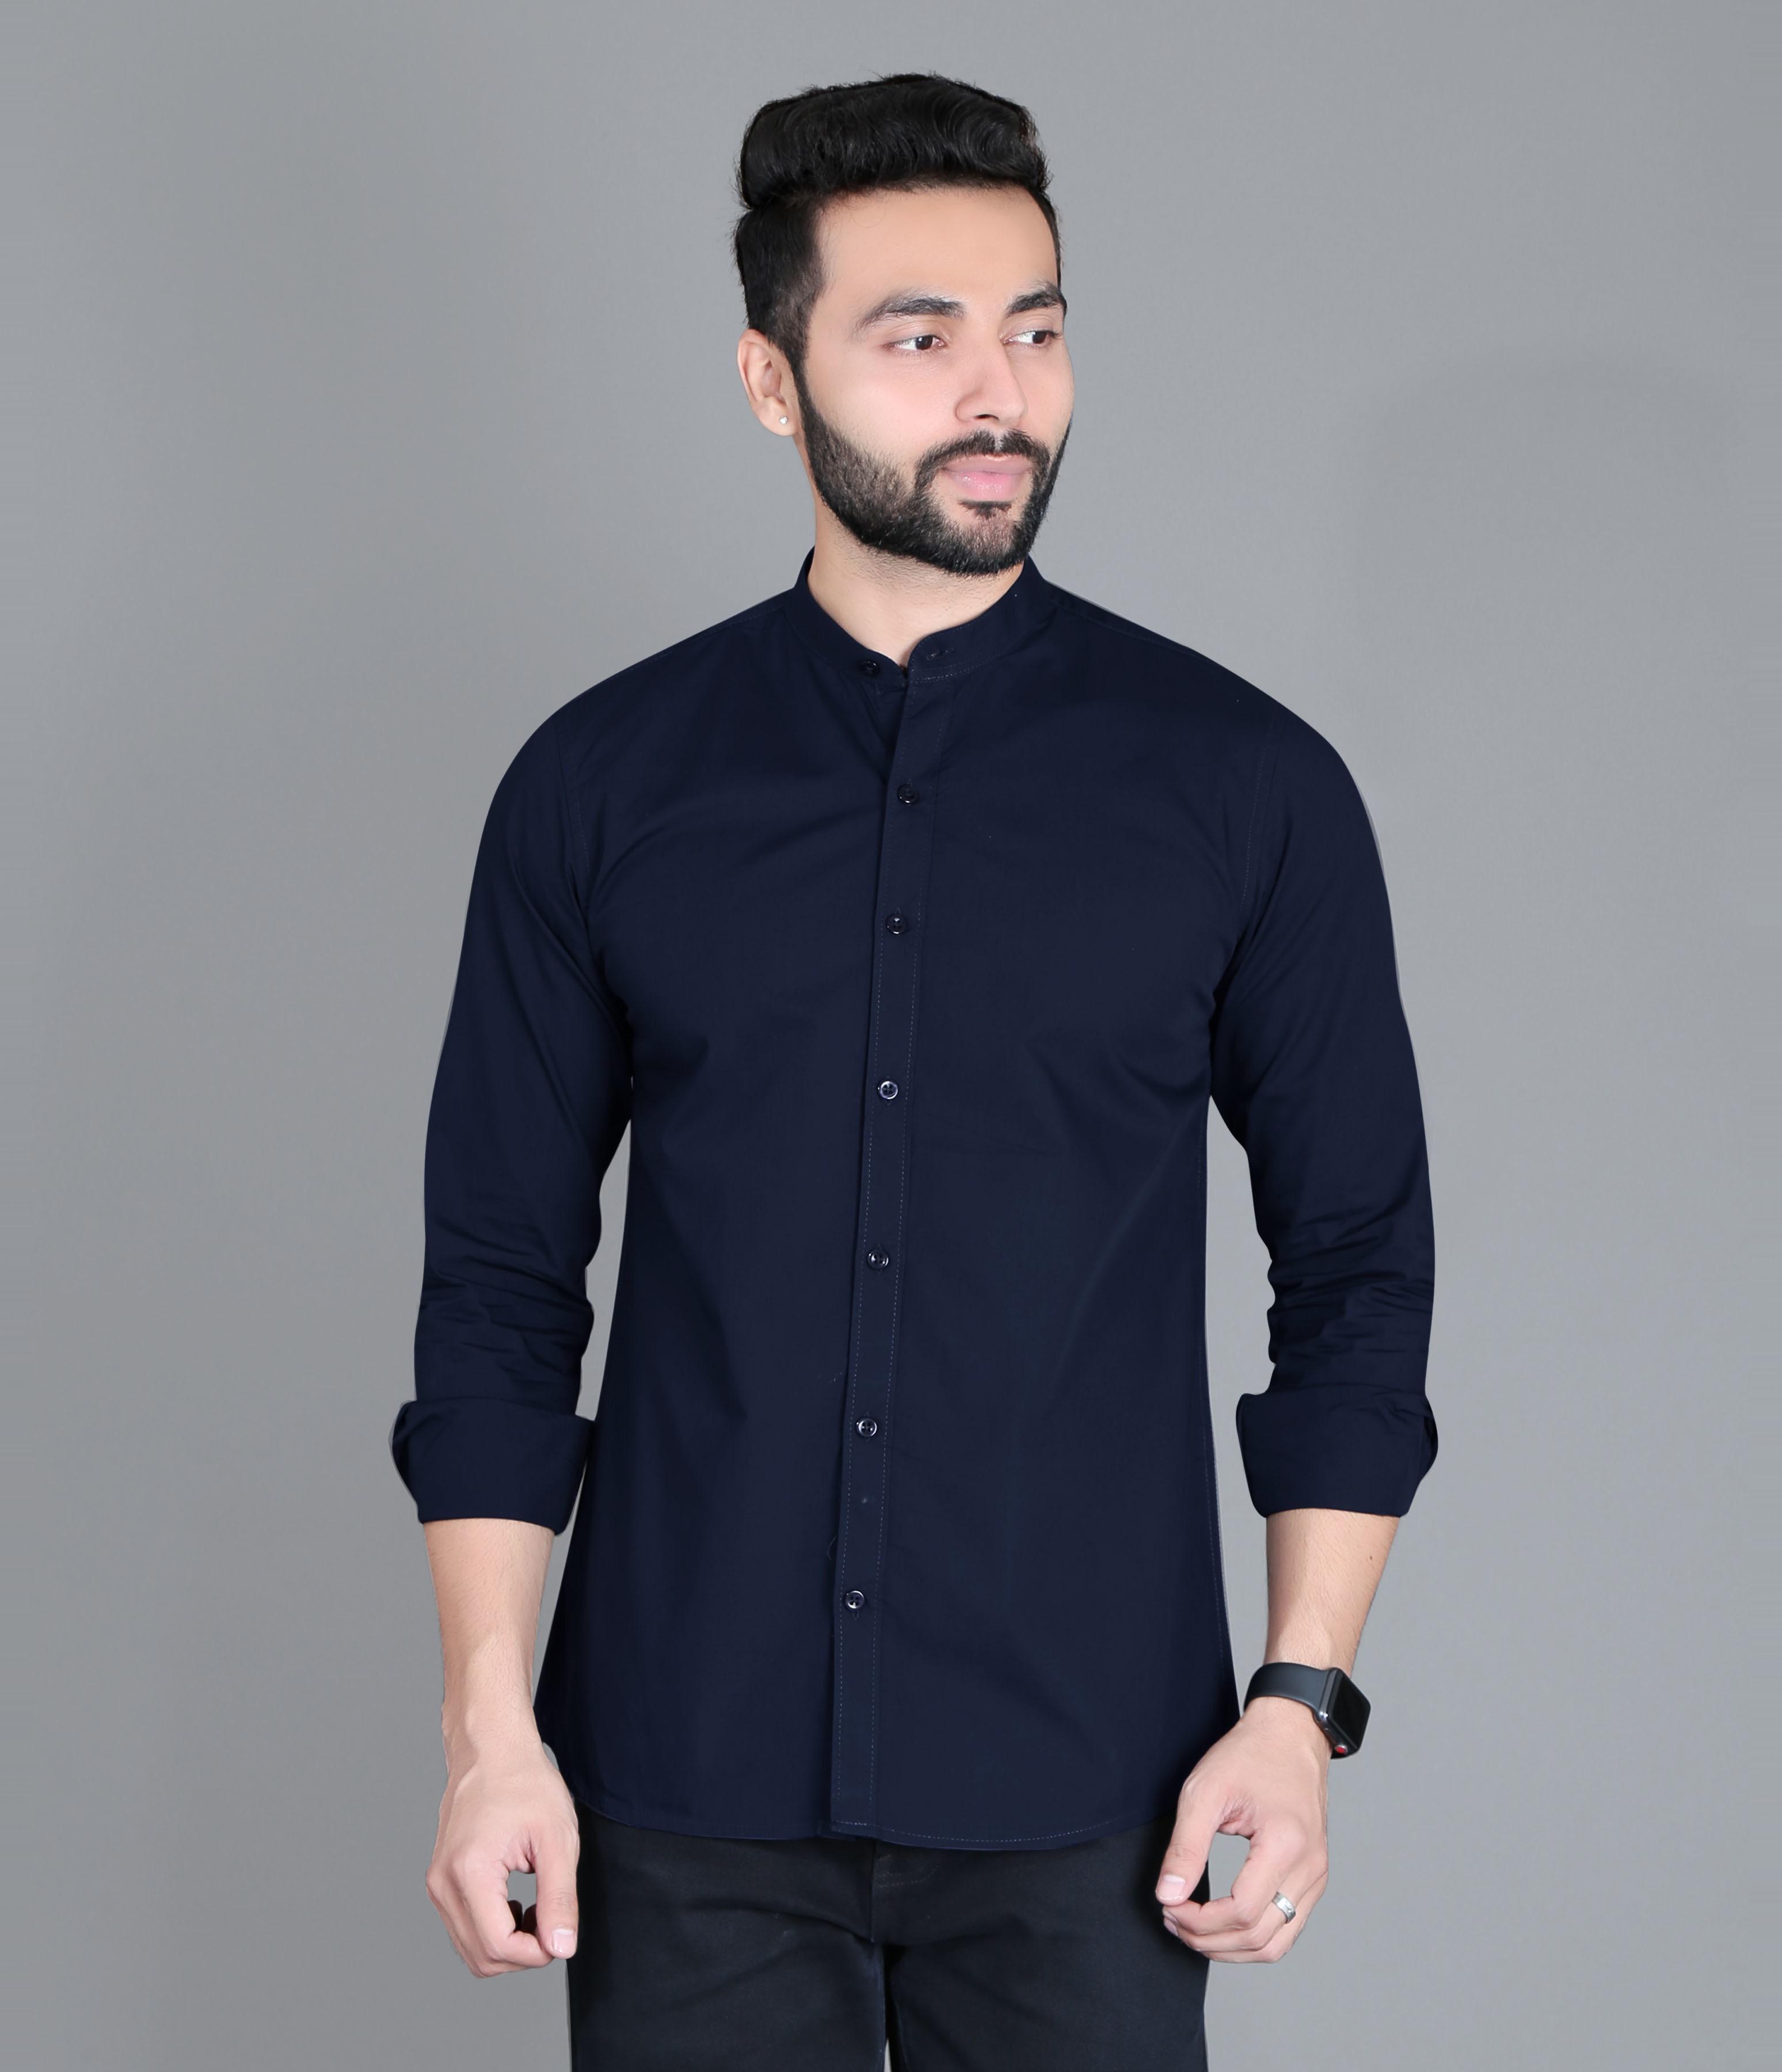 FIFTH ANFOLD Casual Mandrin Collar full Sleev/Long Sleev Light Navy Pure Cotton Plain Solid Men Shirt